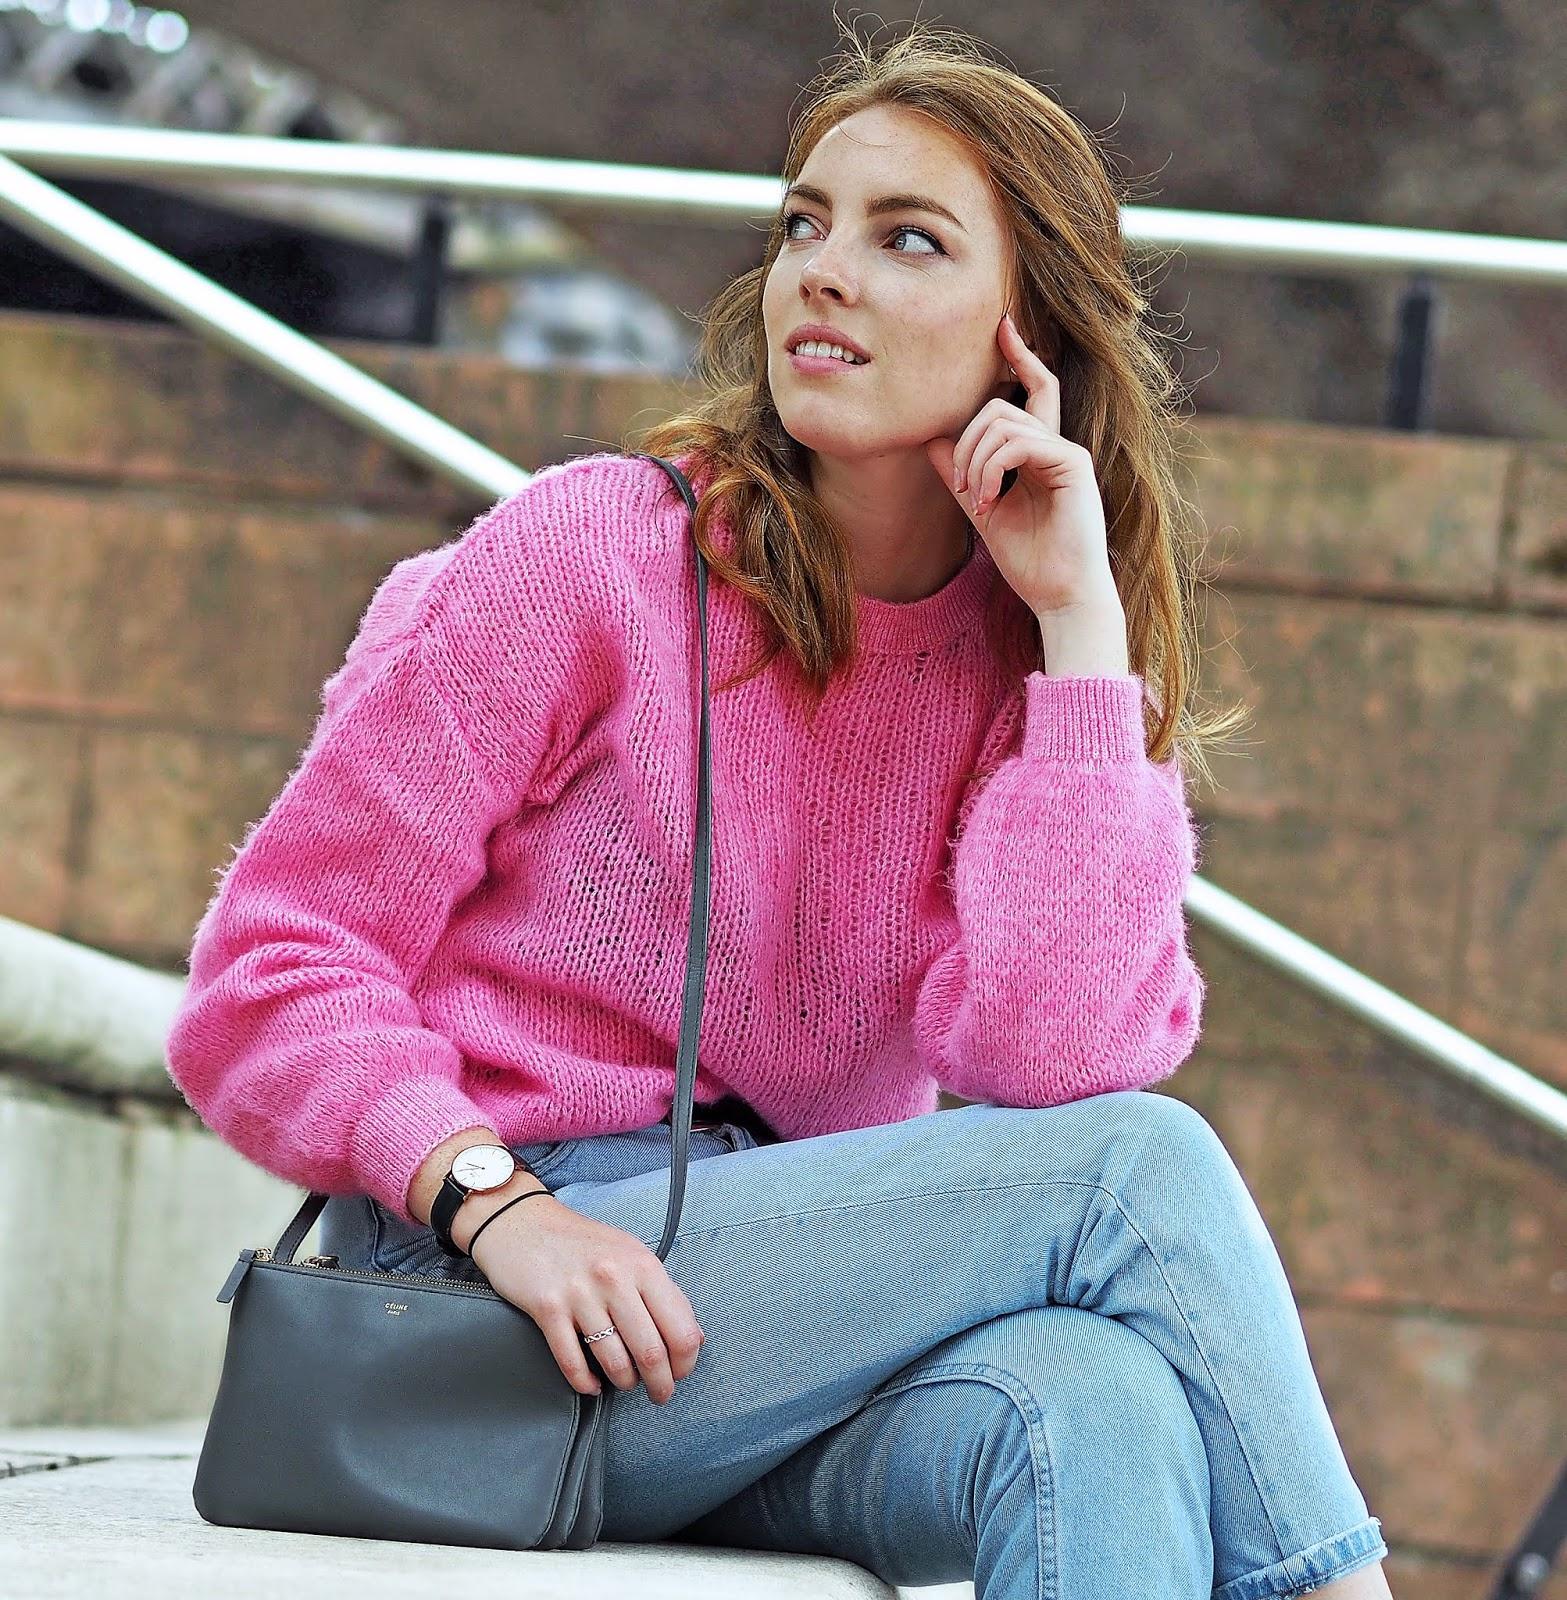 bershka pink knitwear